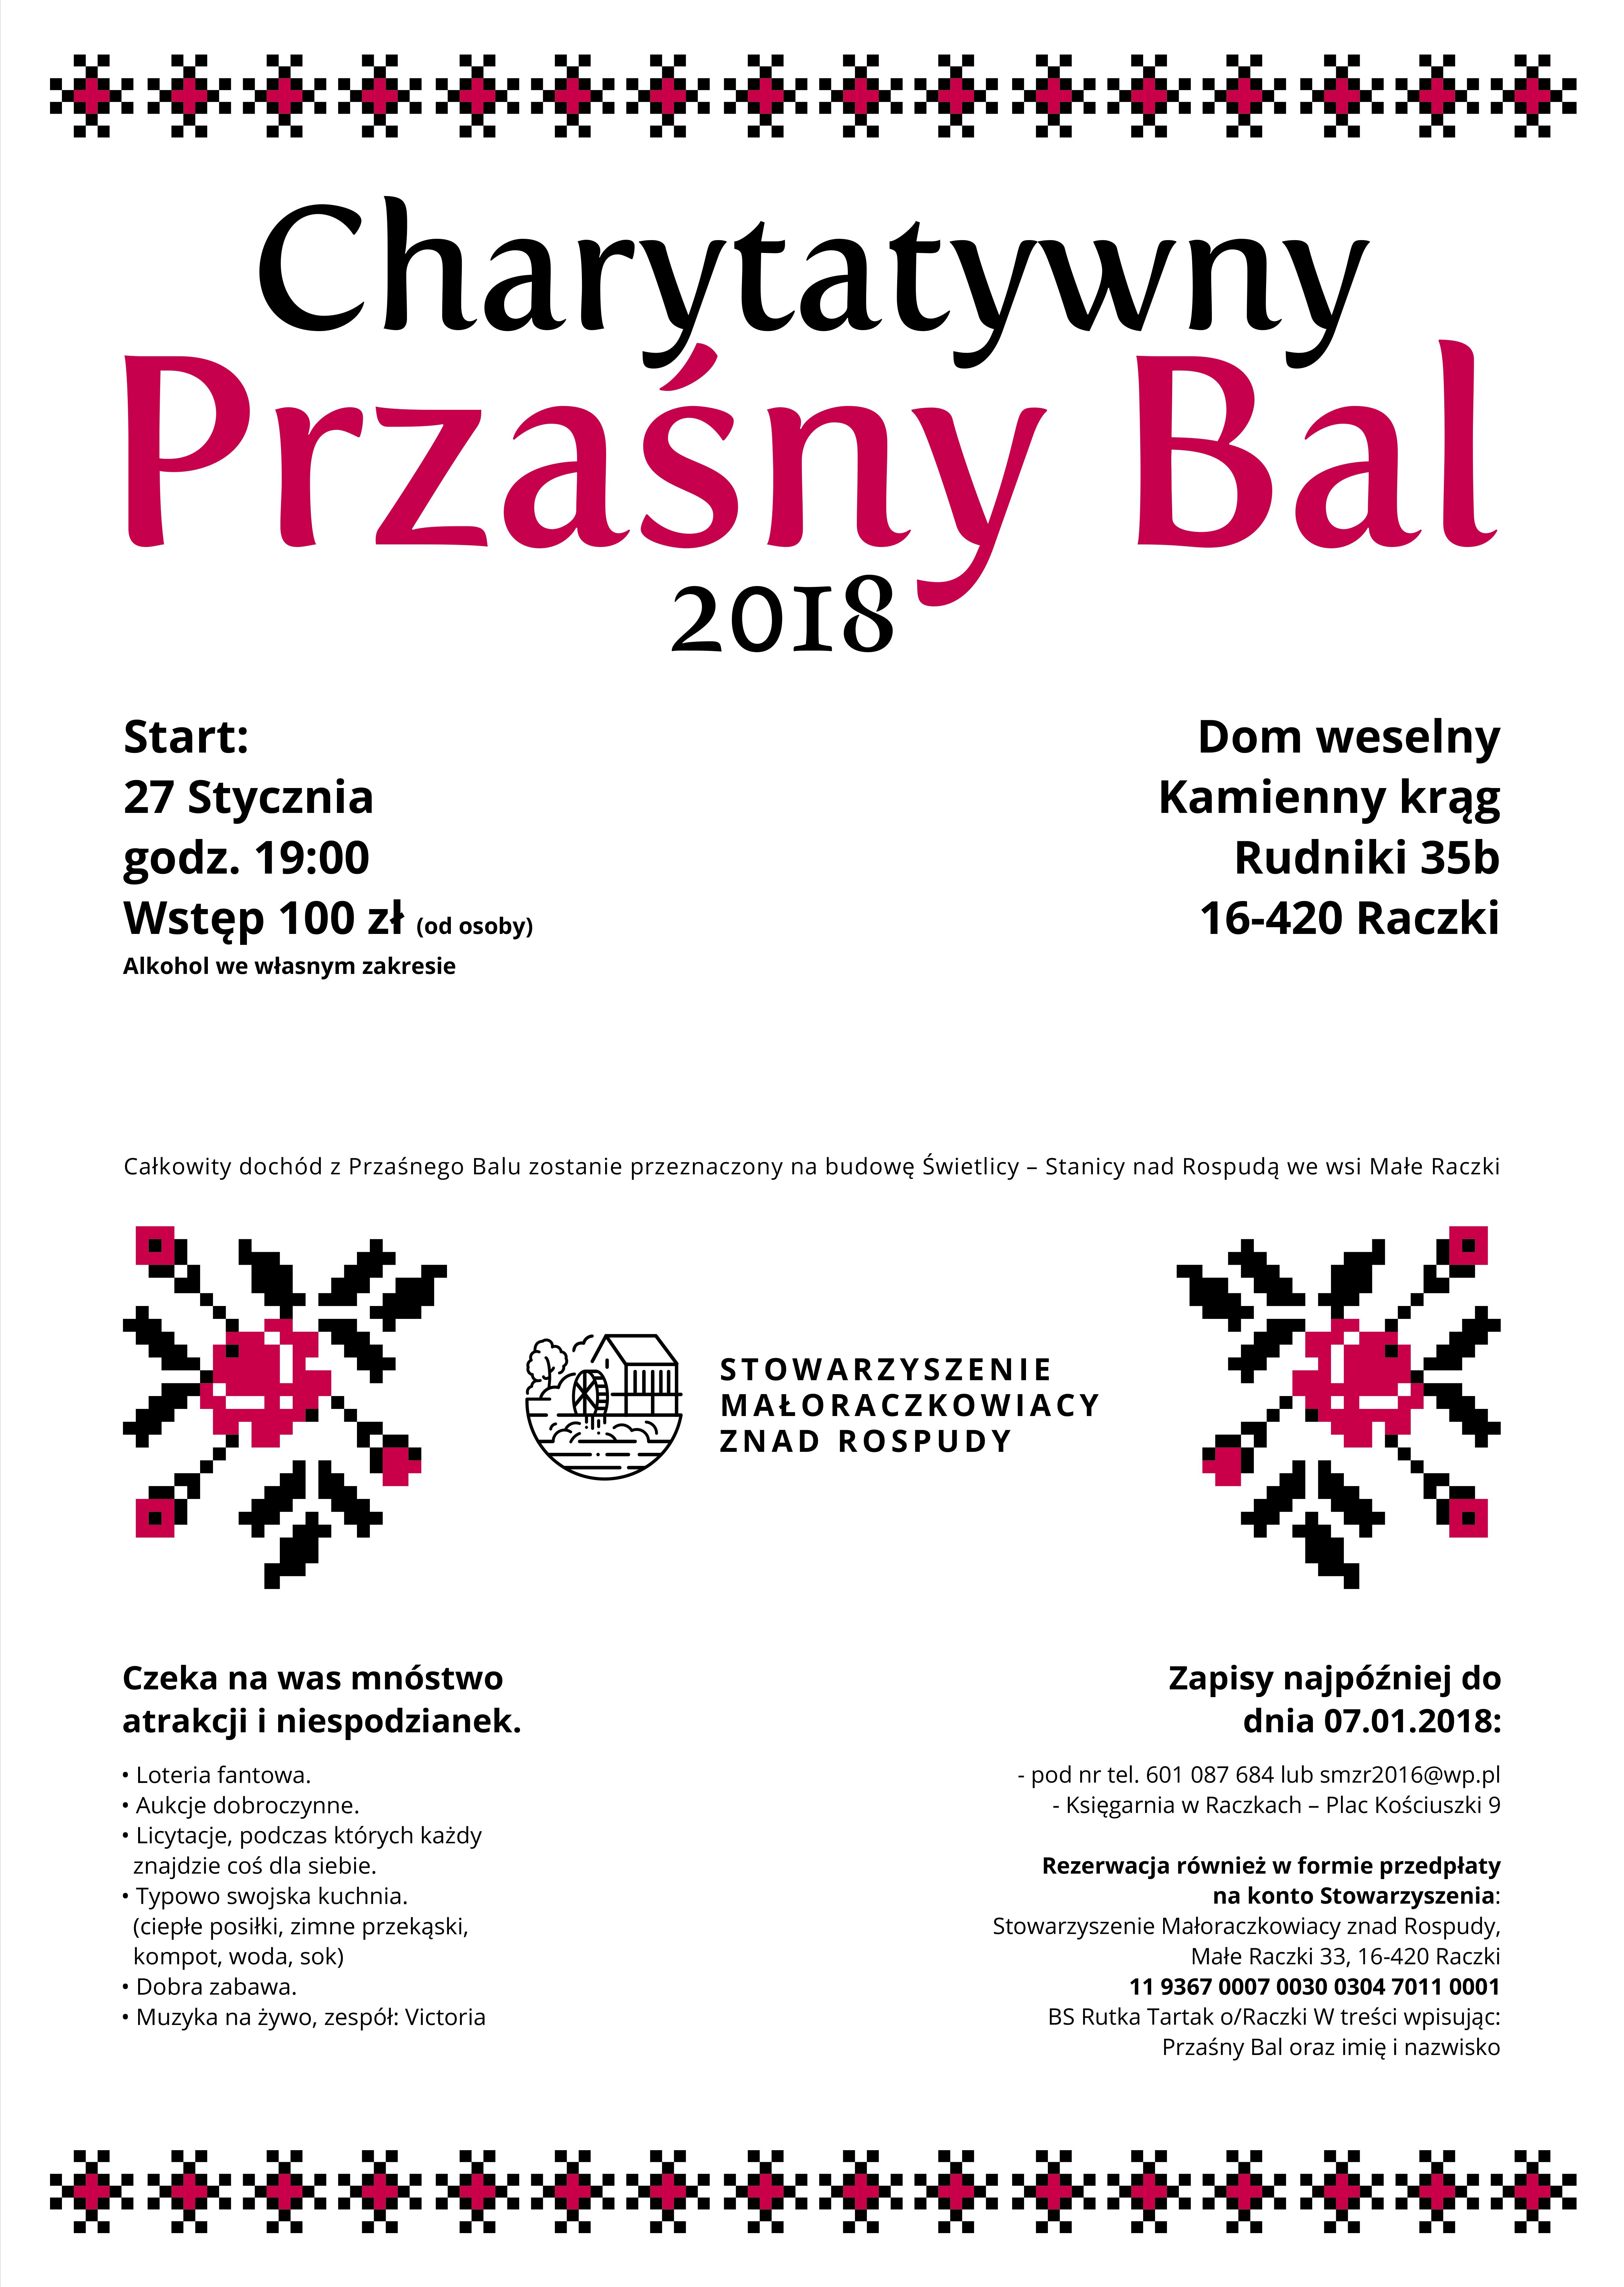 http://m.wm.pl/2017/12/orig/przas-ny-bal-a2-wersjac-plakat-437389.jpg